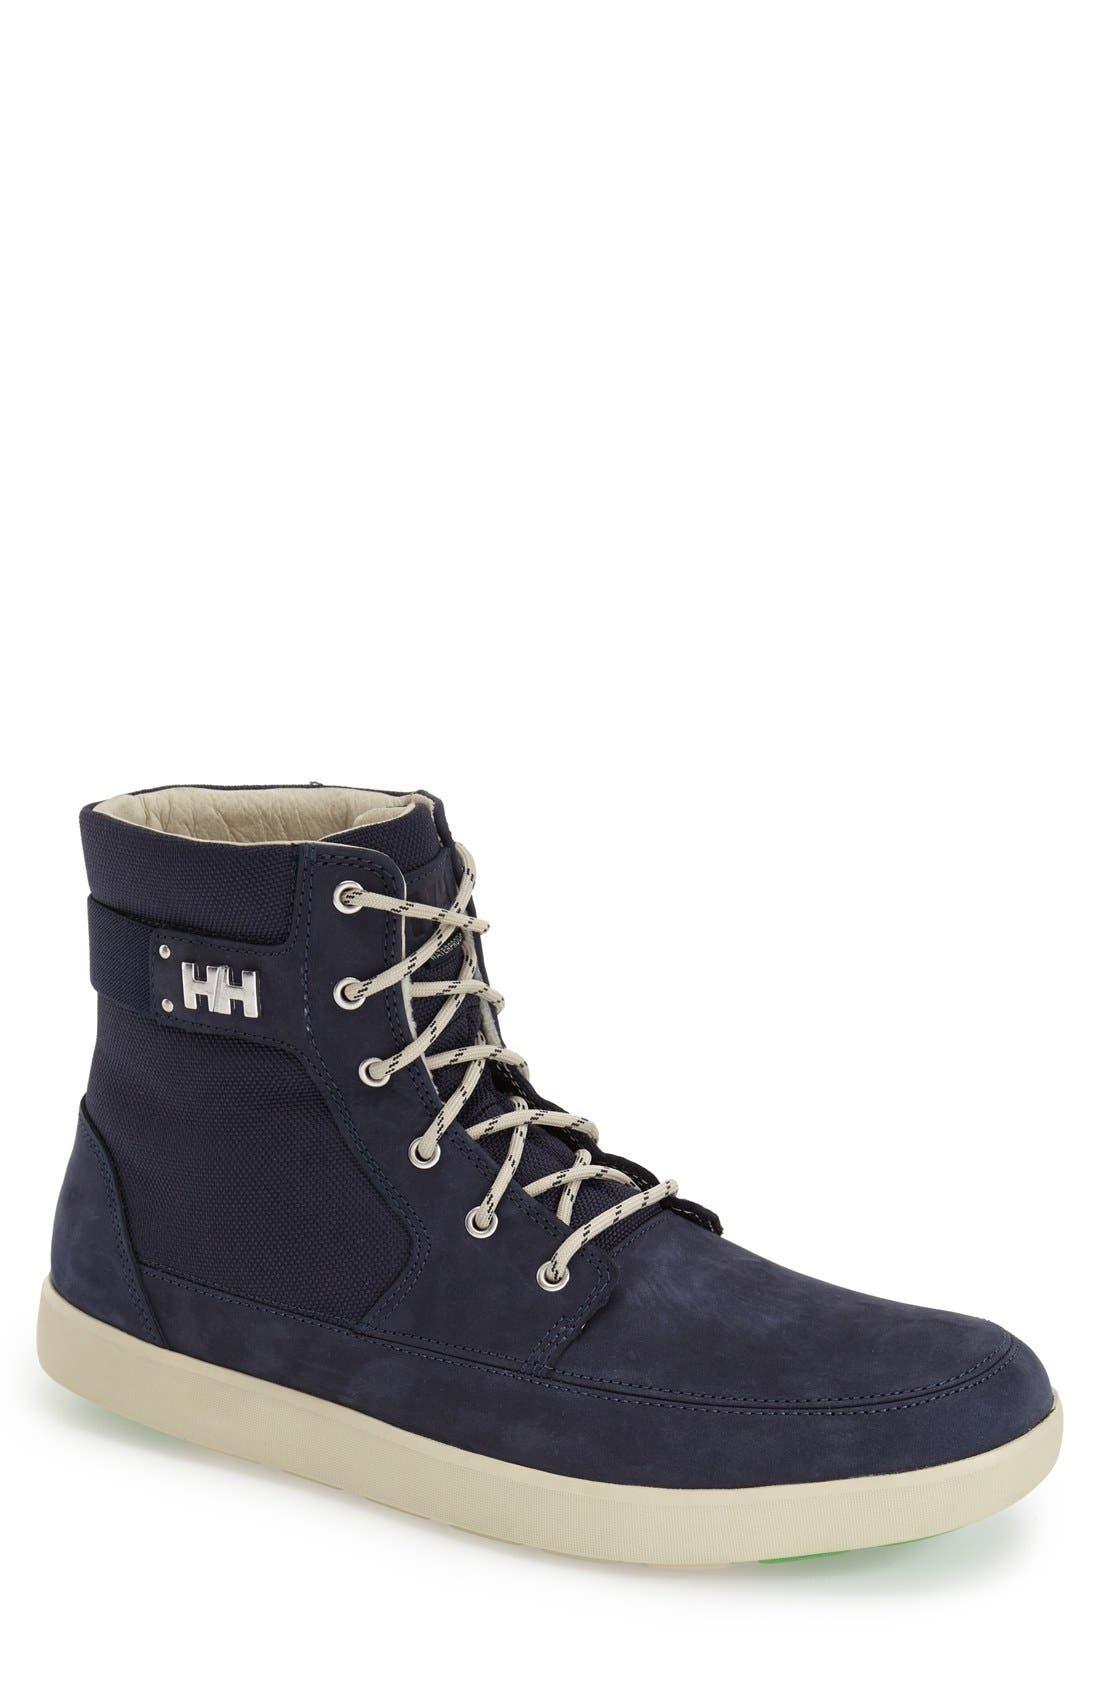 'Stockholm' Waterproof High Top Sneaker,                         Main,                         color, 489